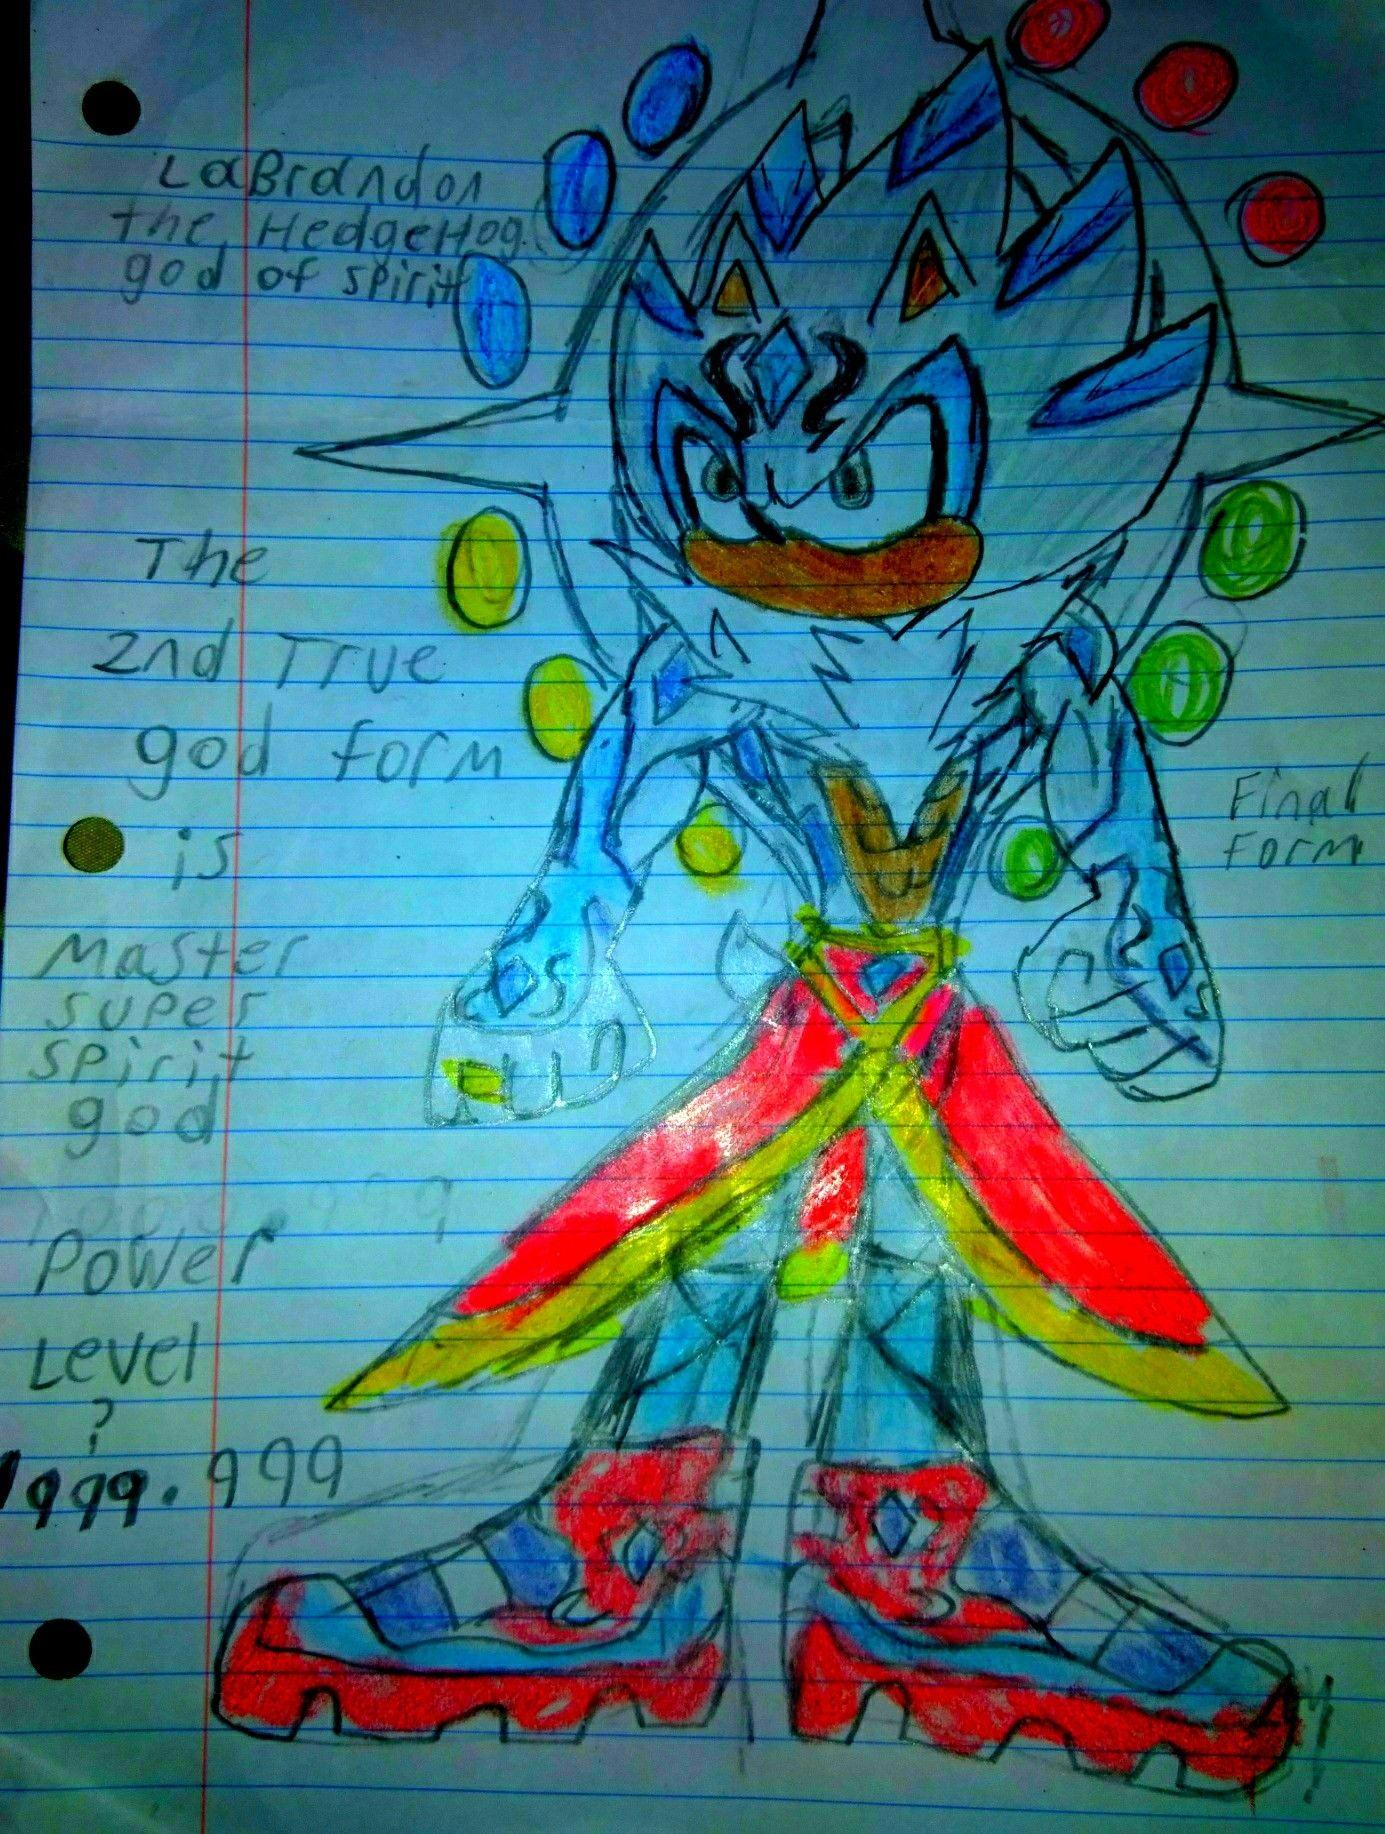 Pin By Labrandon Martin On Suprema Sombra Sonic Art Pics Hero